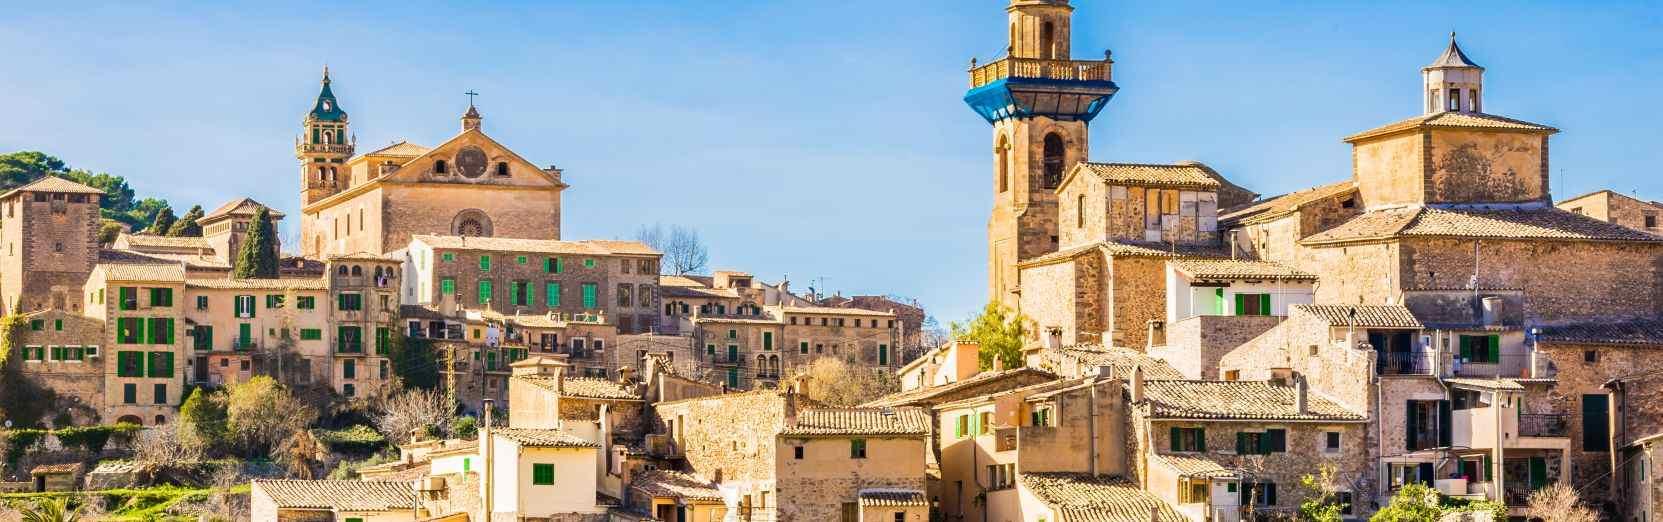 Mallorca Mietwagen ohne Kaution